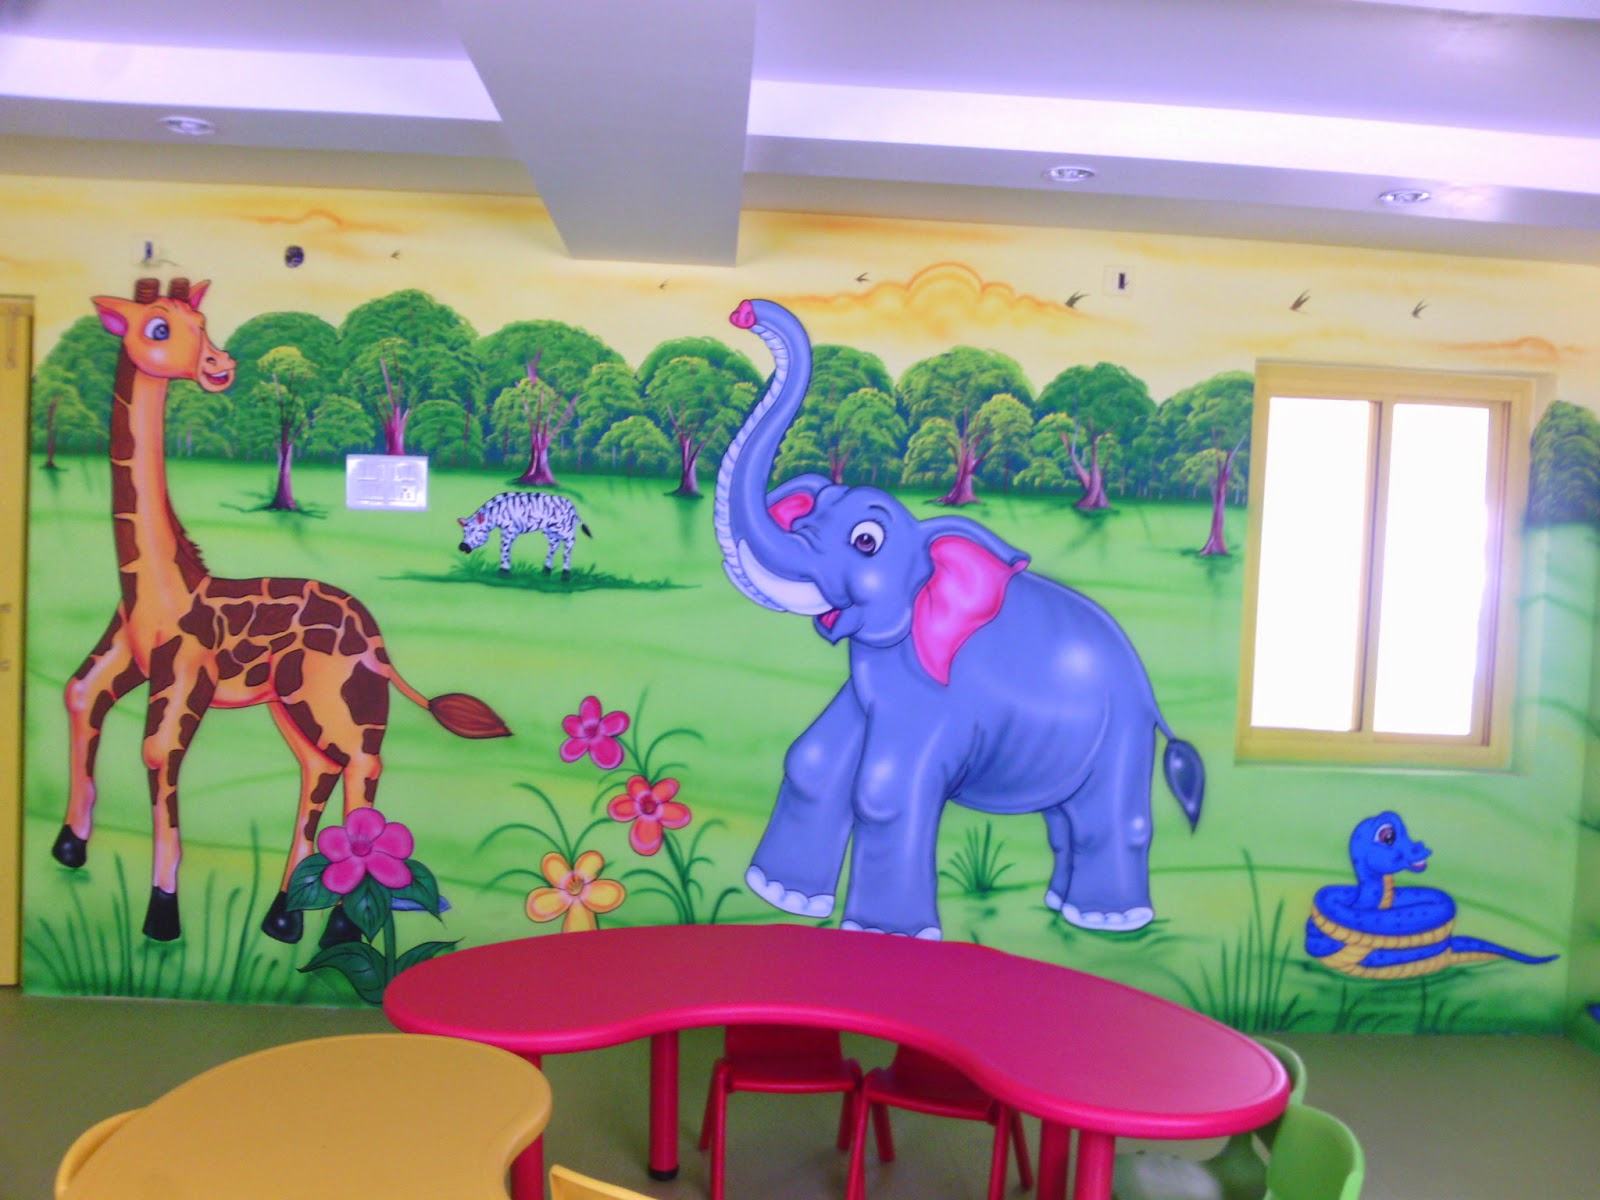 Wall Decoration In Play School : Play school wall painting d cartoon